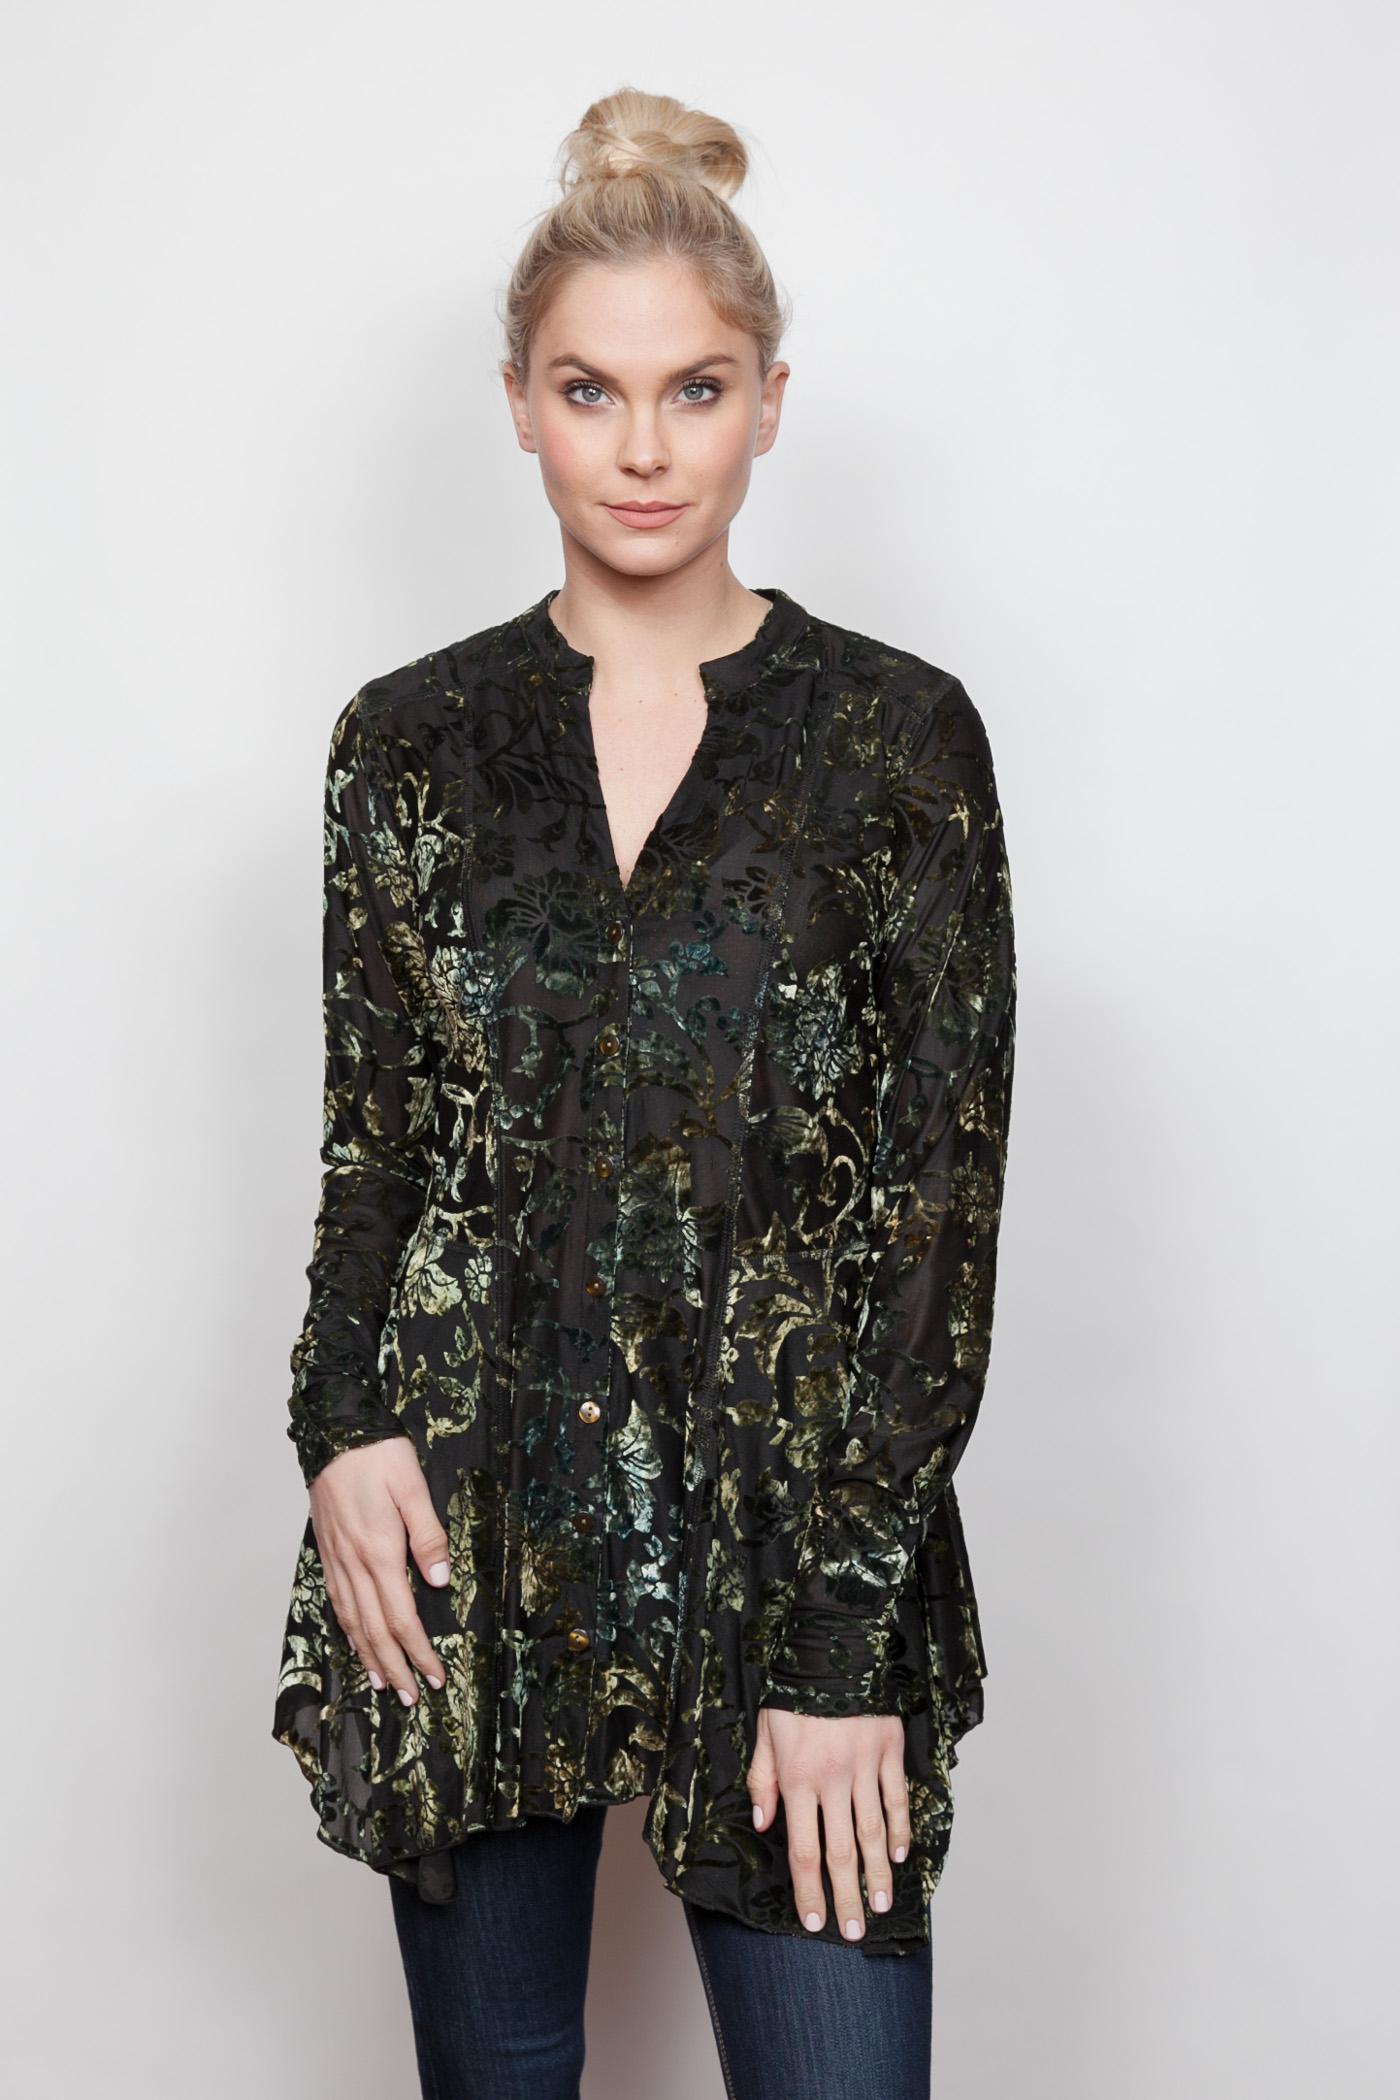 Copy of Style # 13202-18, p 12 </br>Burnout Velvet Prints </br>Pattern: Emerald + 3 others